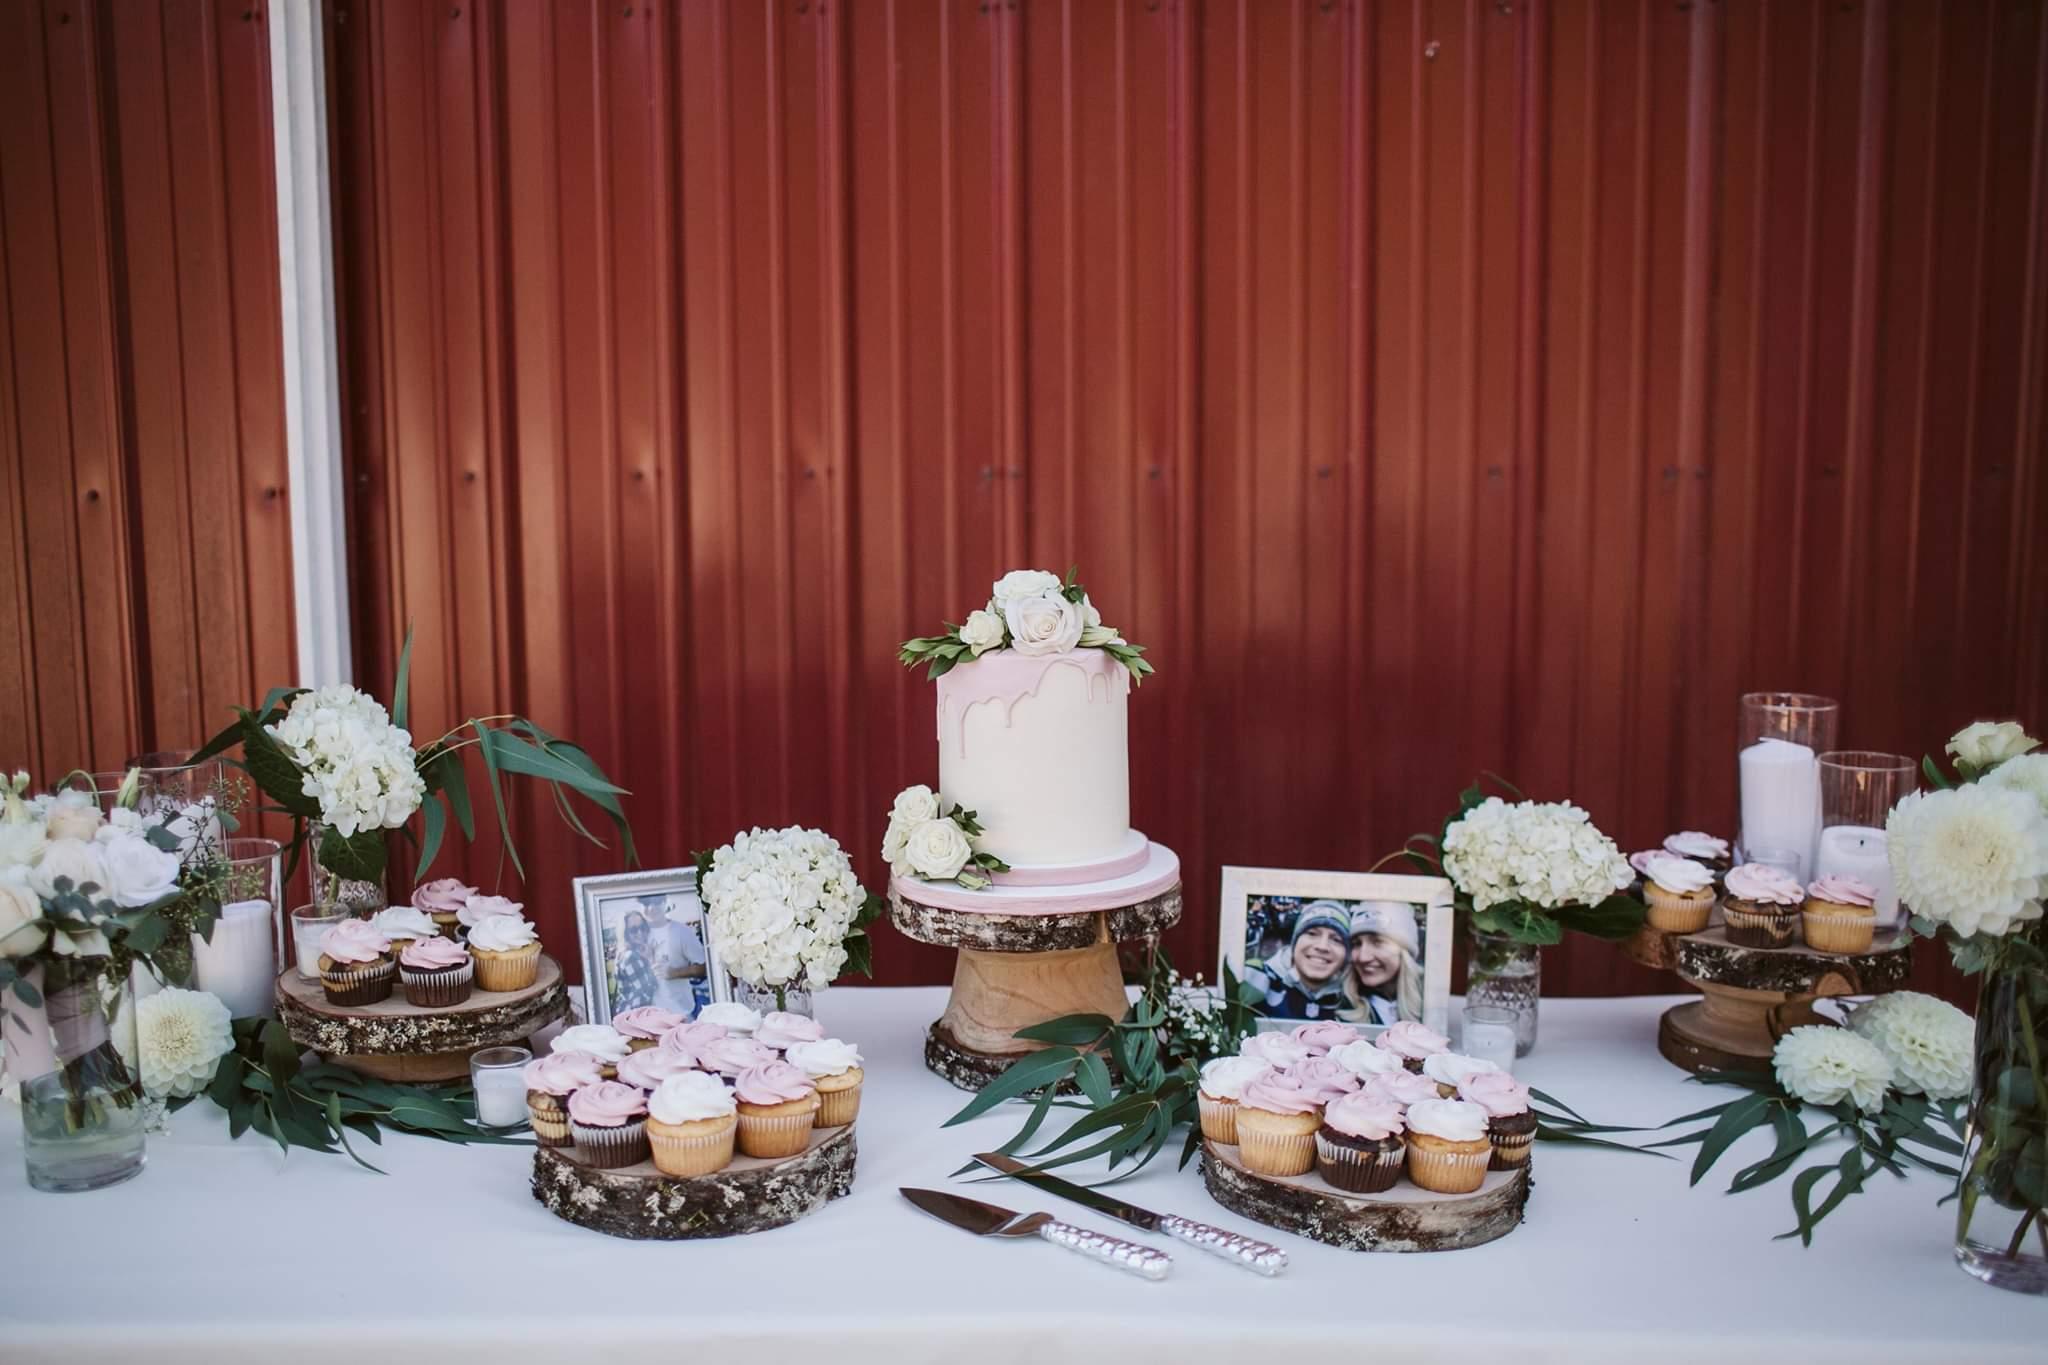 Rustic Cake Set